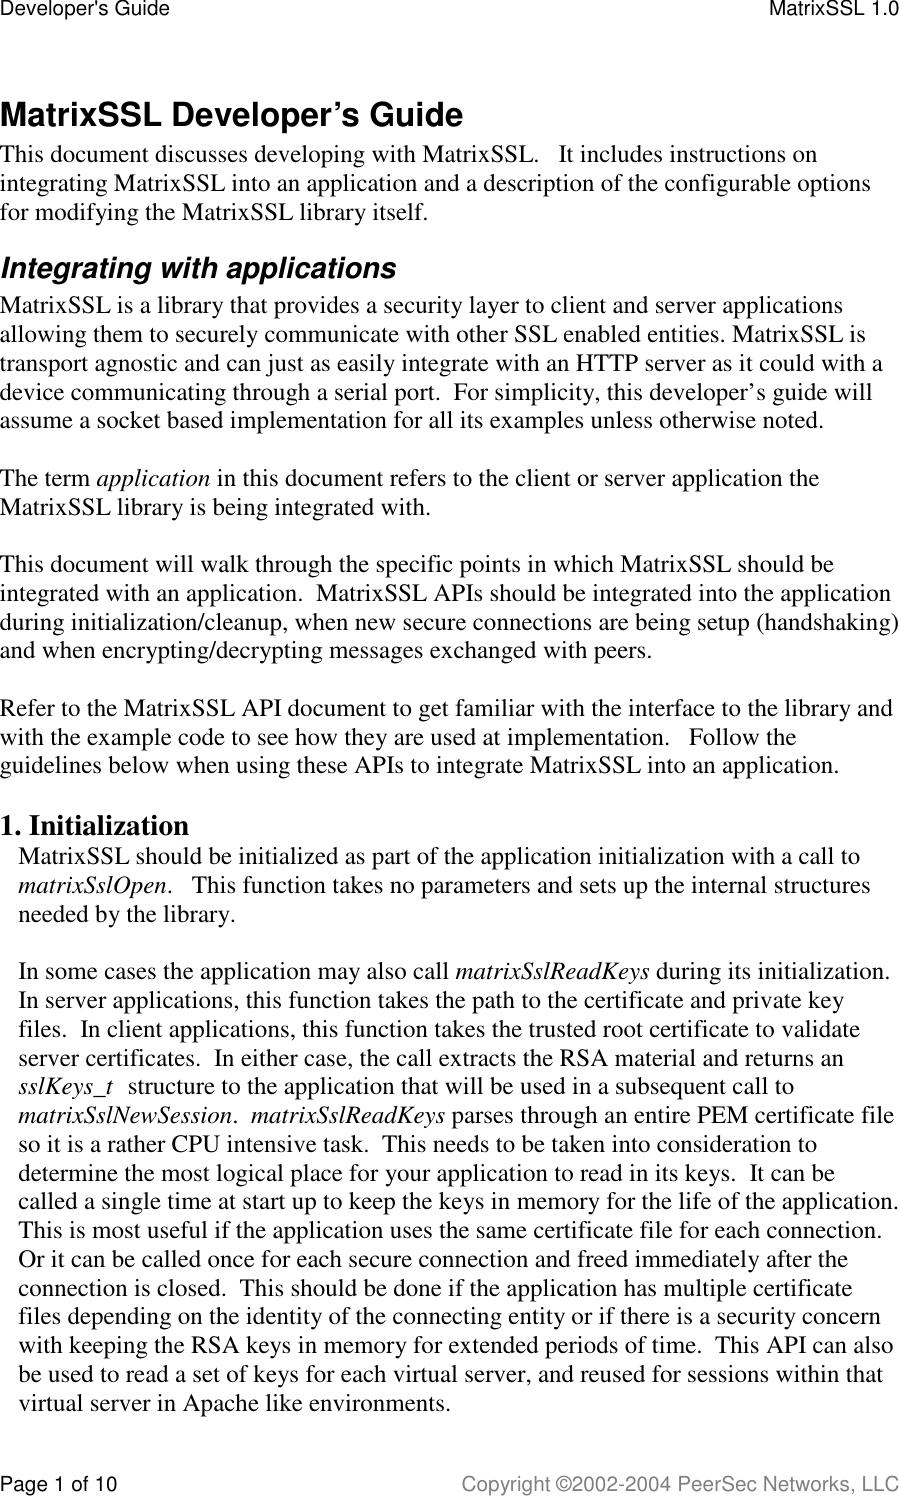 Matrix SSLDeveloper Guide